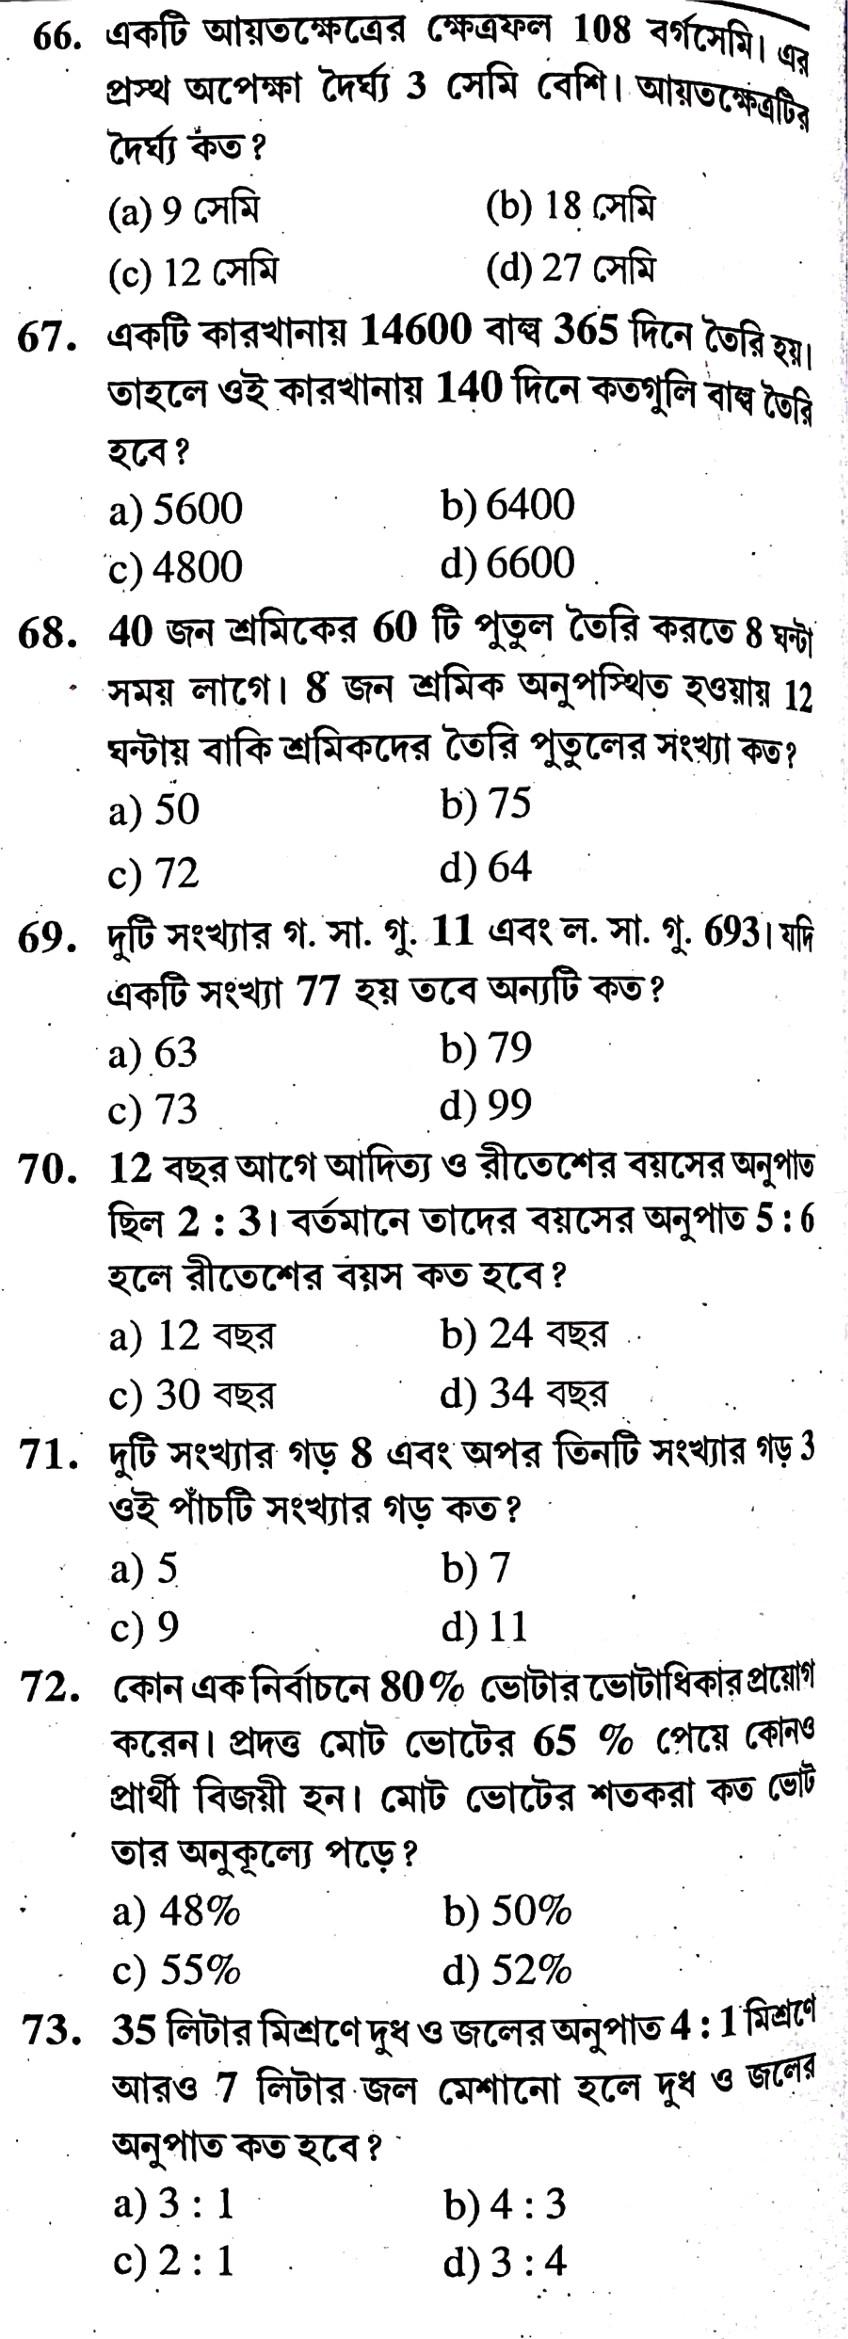 West Bengal Police Constable Preliminary Practice Set - 10 In Bengali || পশ্চিমবঙ্গ পুলিশ কনস্টেবল প্রিলিমিনারী প্র্যাকটিস সেট -১০